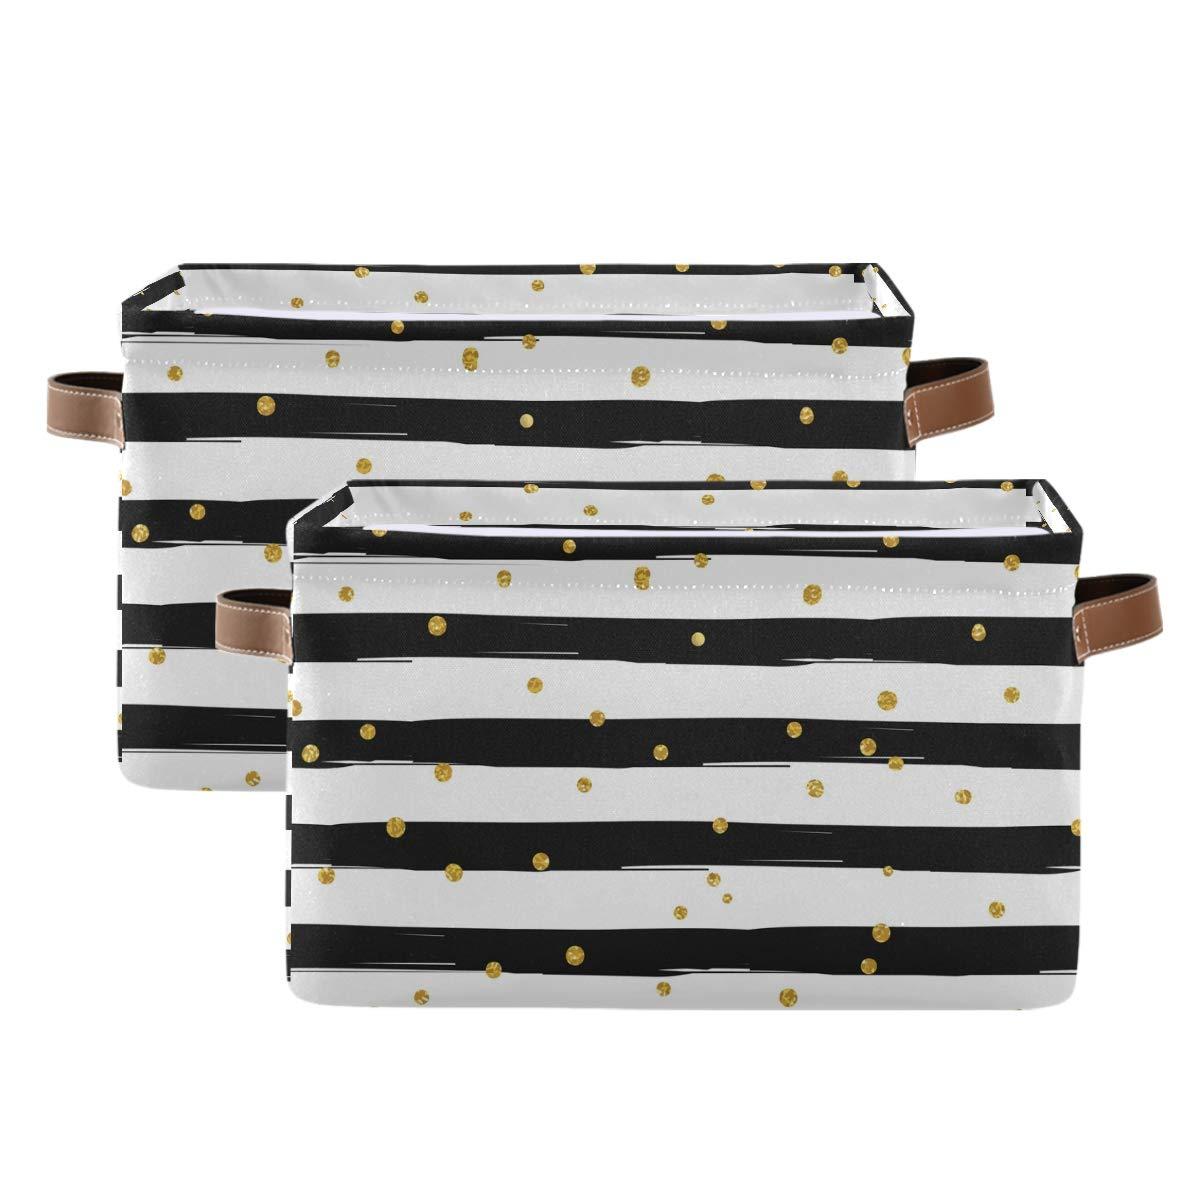 Kelekey Golden Polka Dot Stripe Large Basket Popular product Collapsible Storage Max 73% OFF